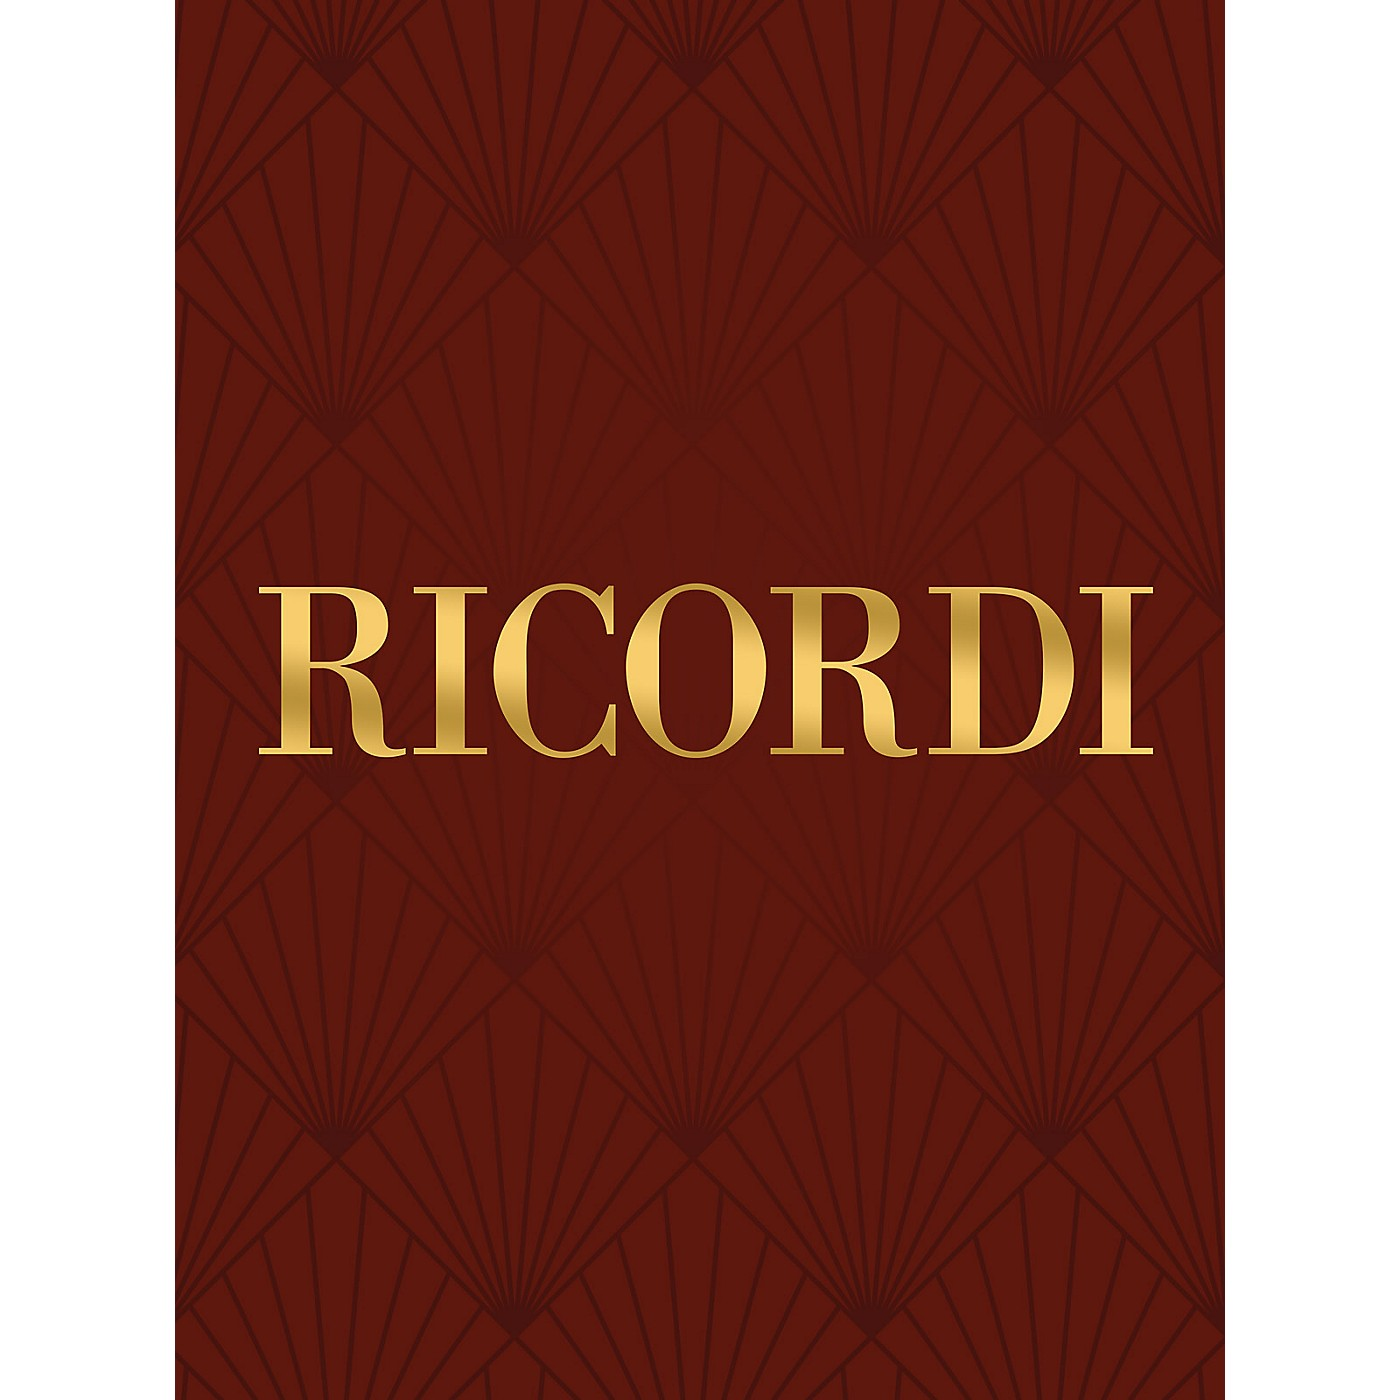 Ricordi Conc in C Min for Violoncello Strings and Basso Continuo RV401 by Antonio Vivaldi Edited by Ephrikian thumbnail